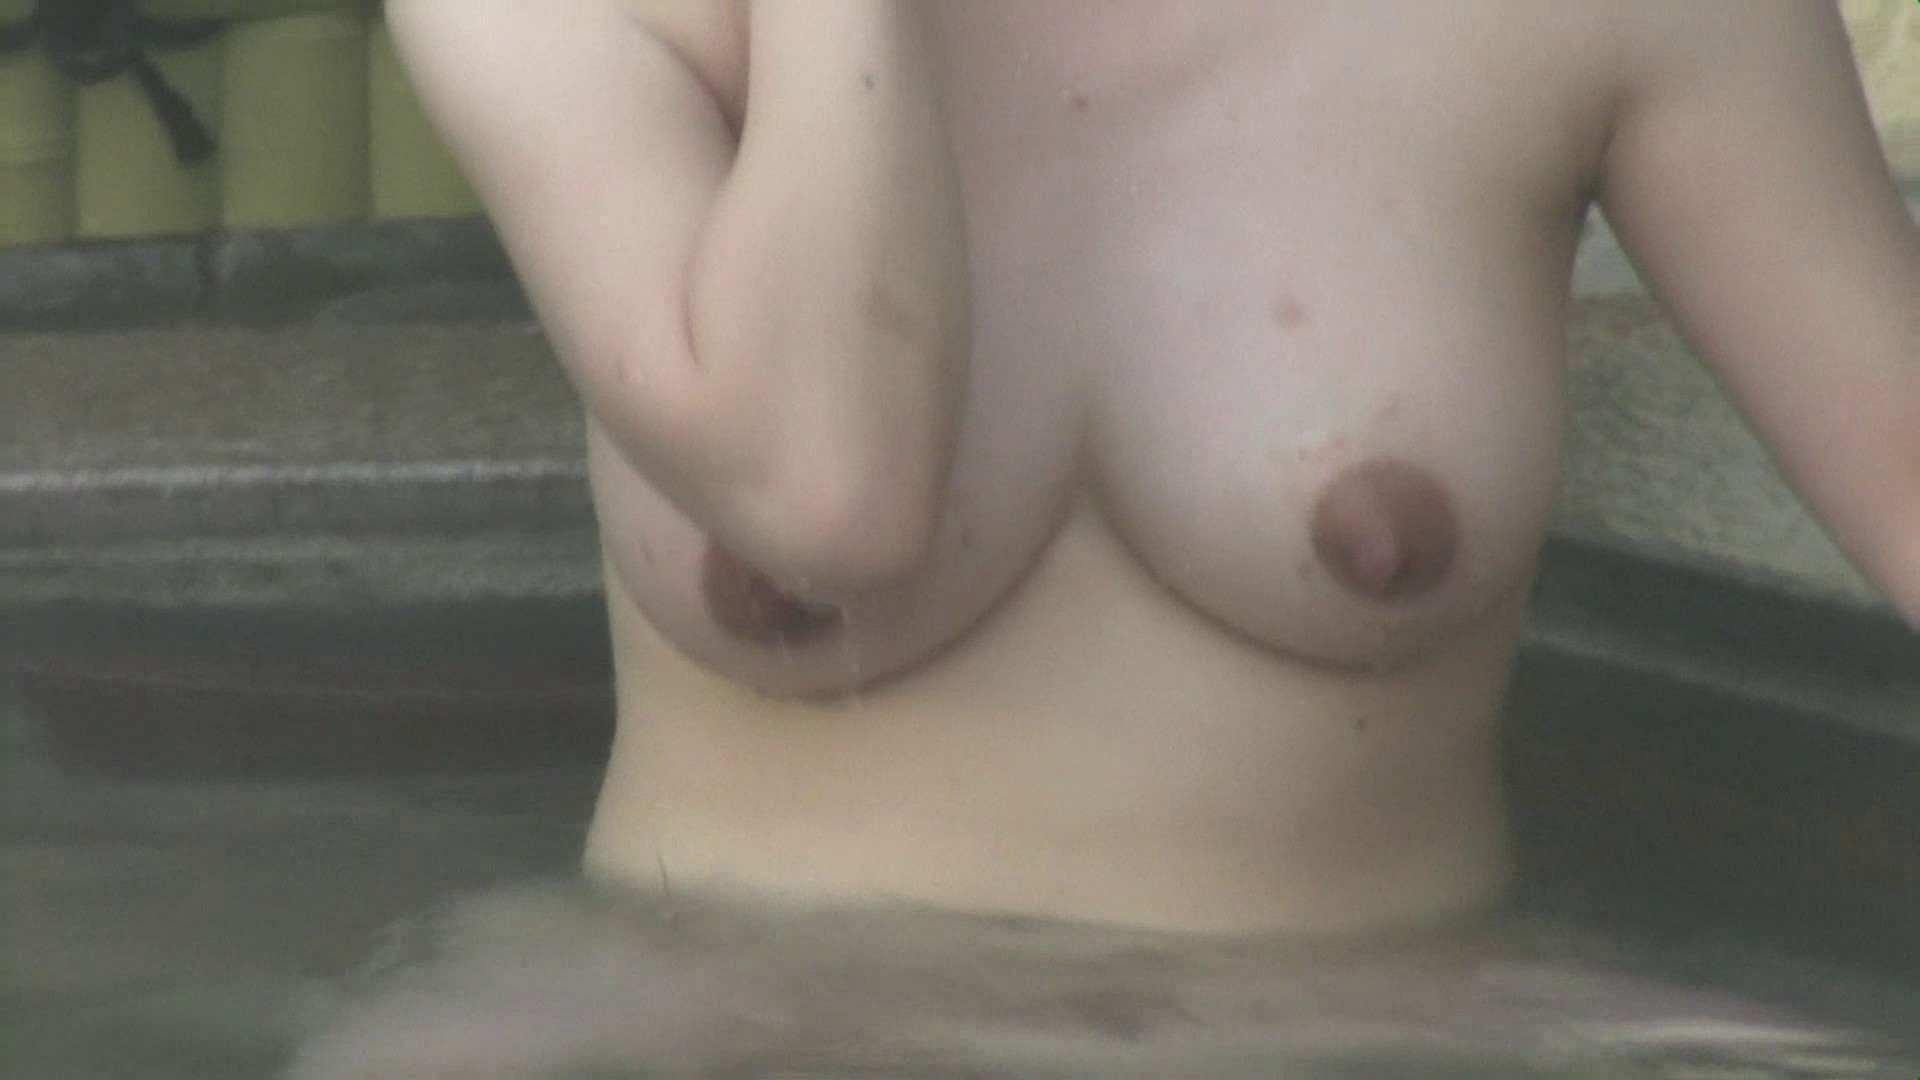 Aquaな露天風呂Vol.606 露天 スケベ動画紹介 110枚 77